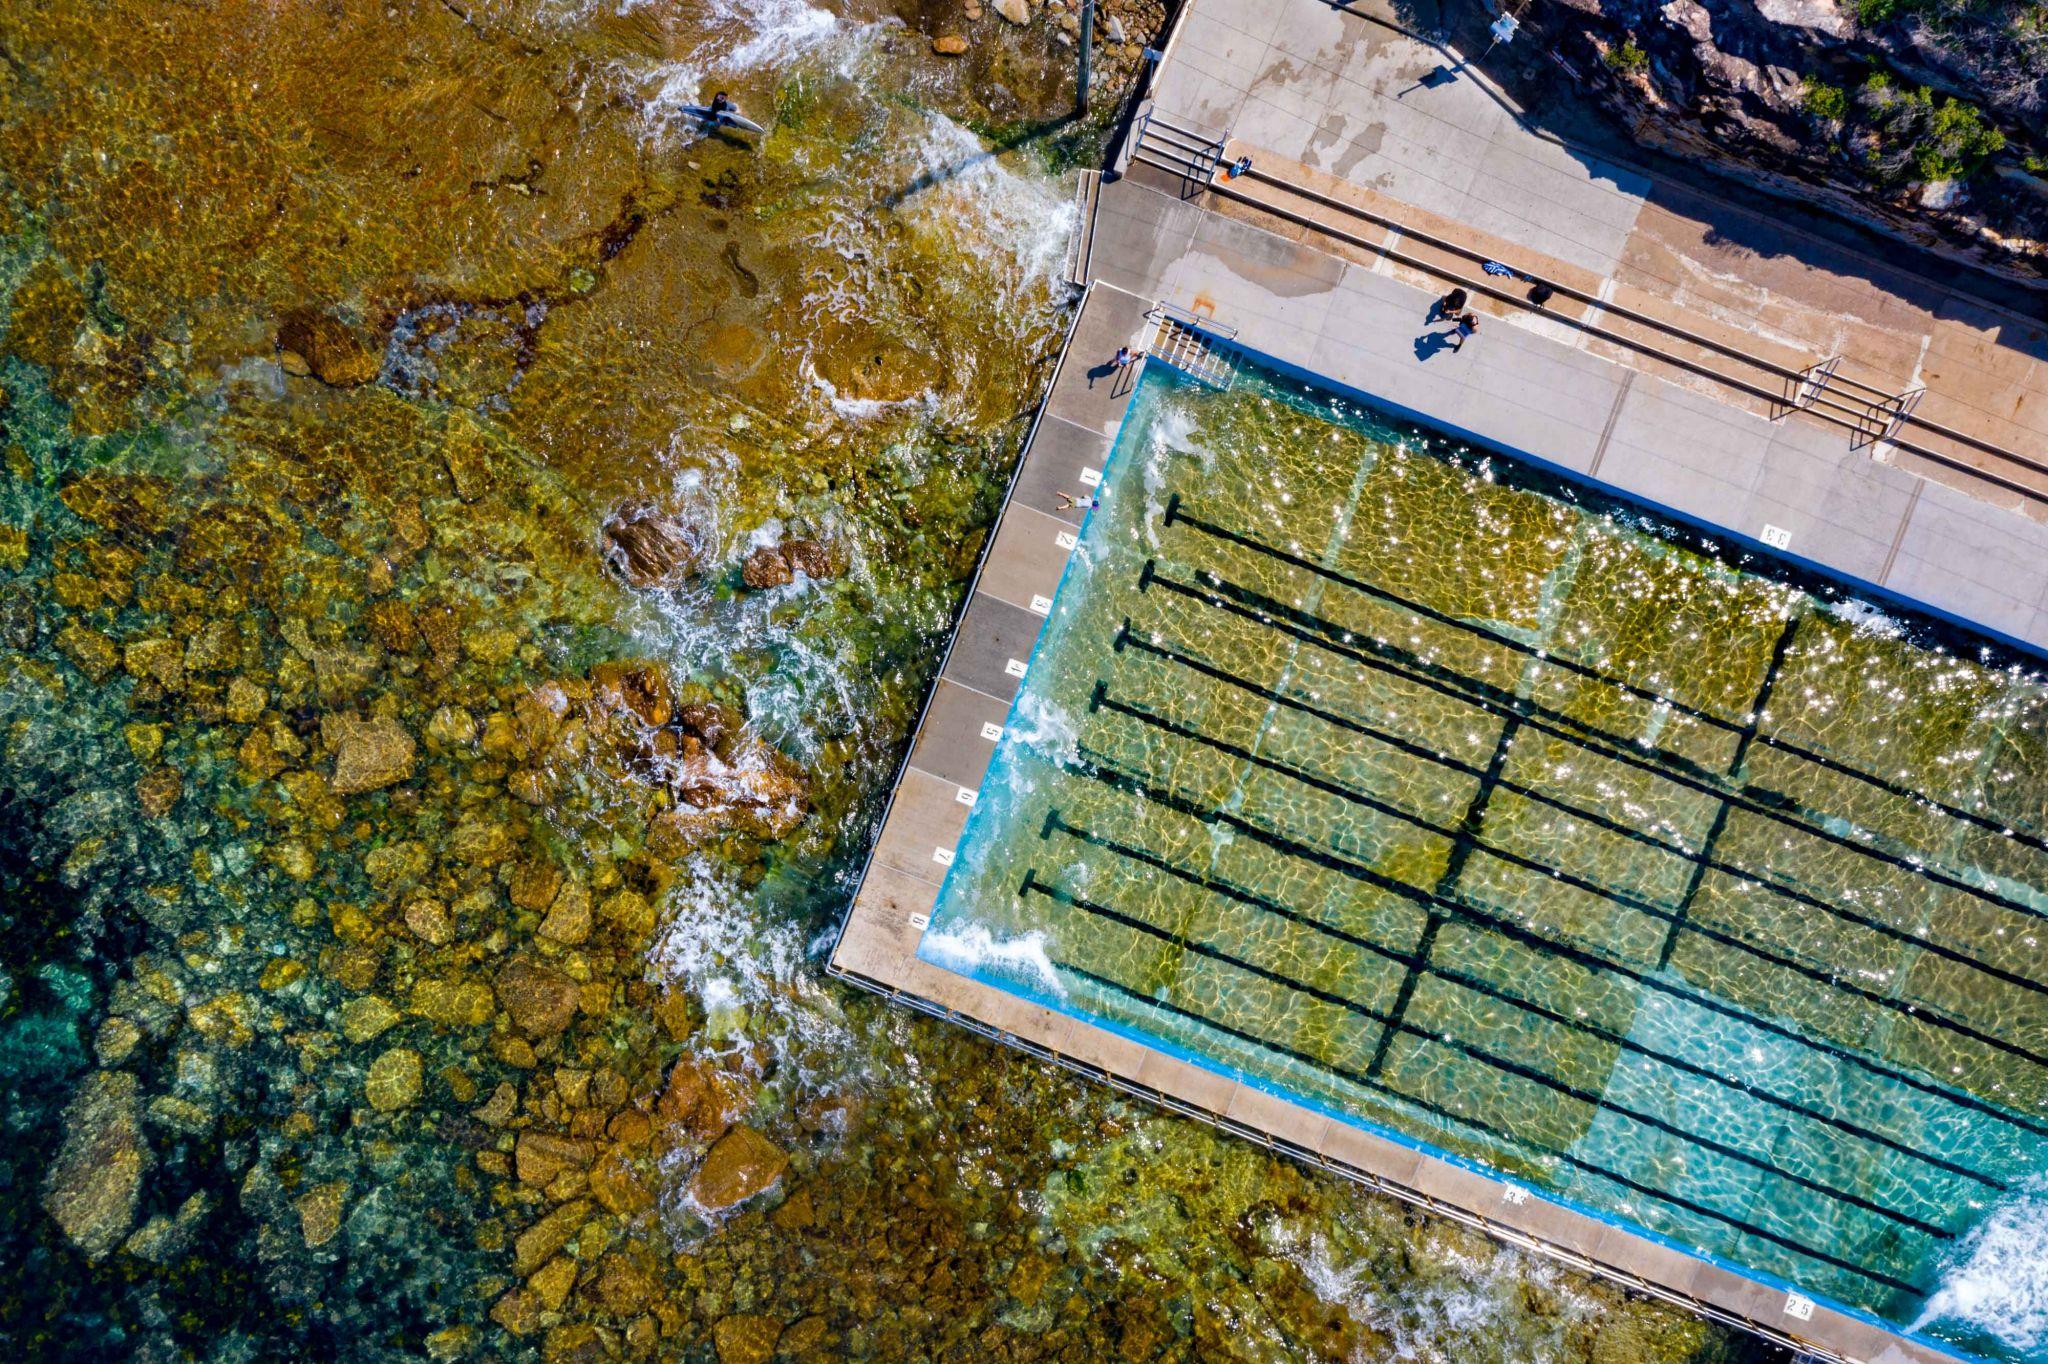 Ocean Pool Freshwater Northern Beaches Sydney NSW, Australia